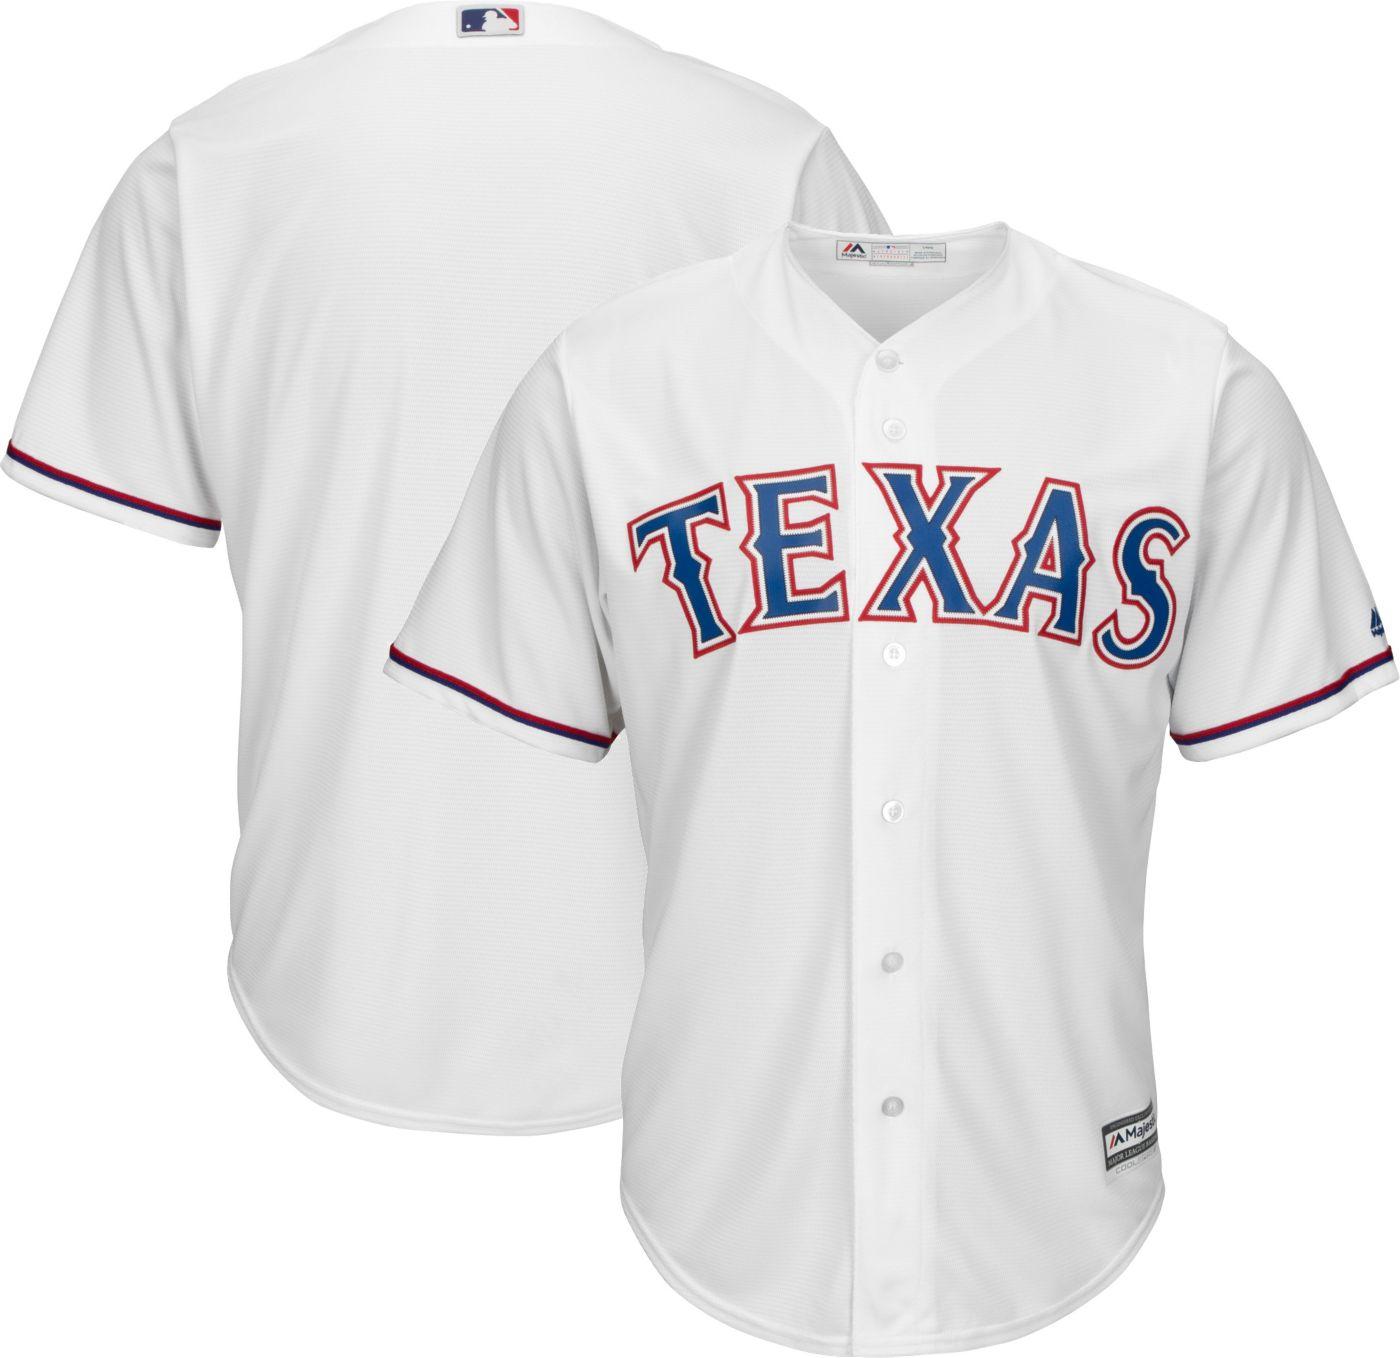 Majestic Men's Replica Texas Rangers Cool Base Home White Jersey